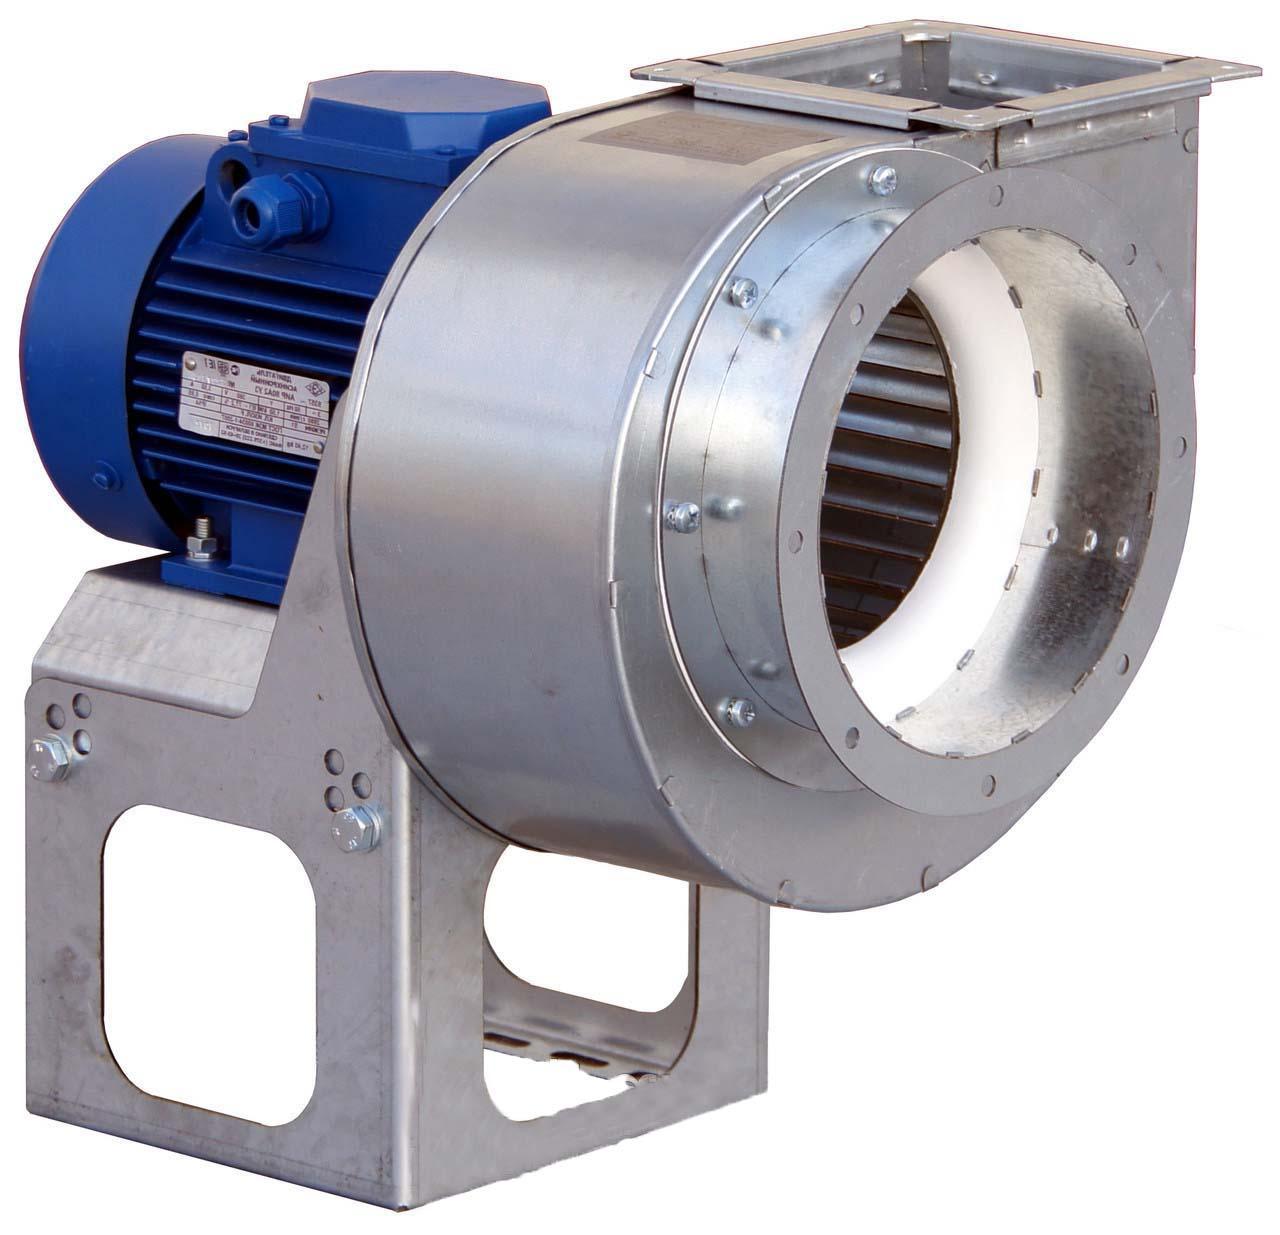 Вентилятор ВР 300-45-3,15 сх.1 (1,50х1500) (Лев 0 град.)